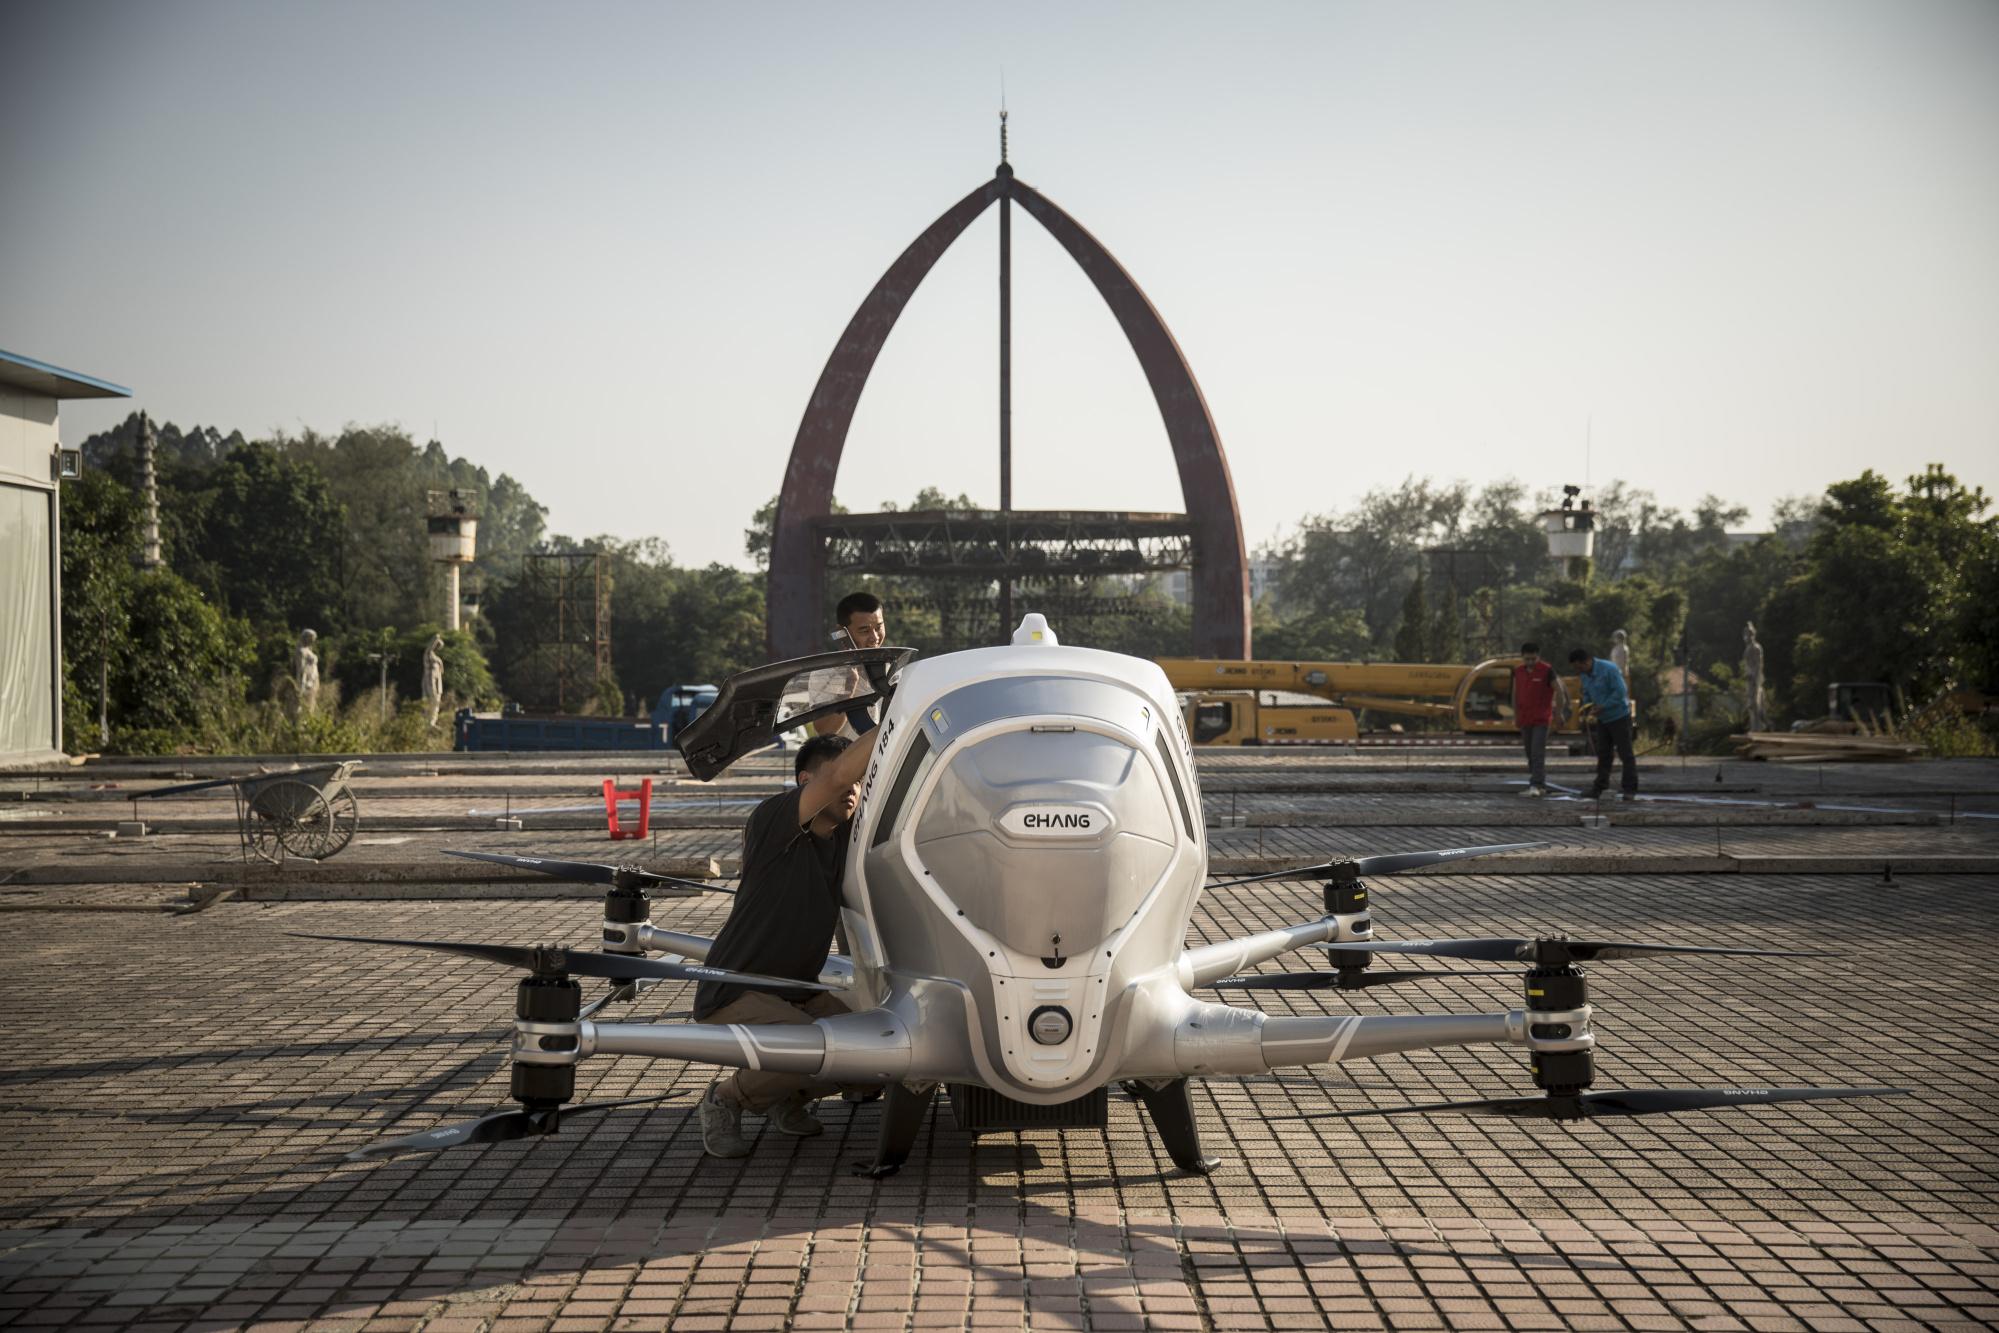 Inside EHang Inc.'s Drone-Testing Facility